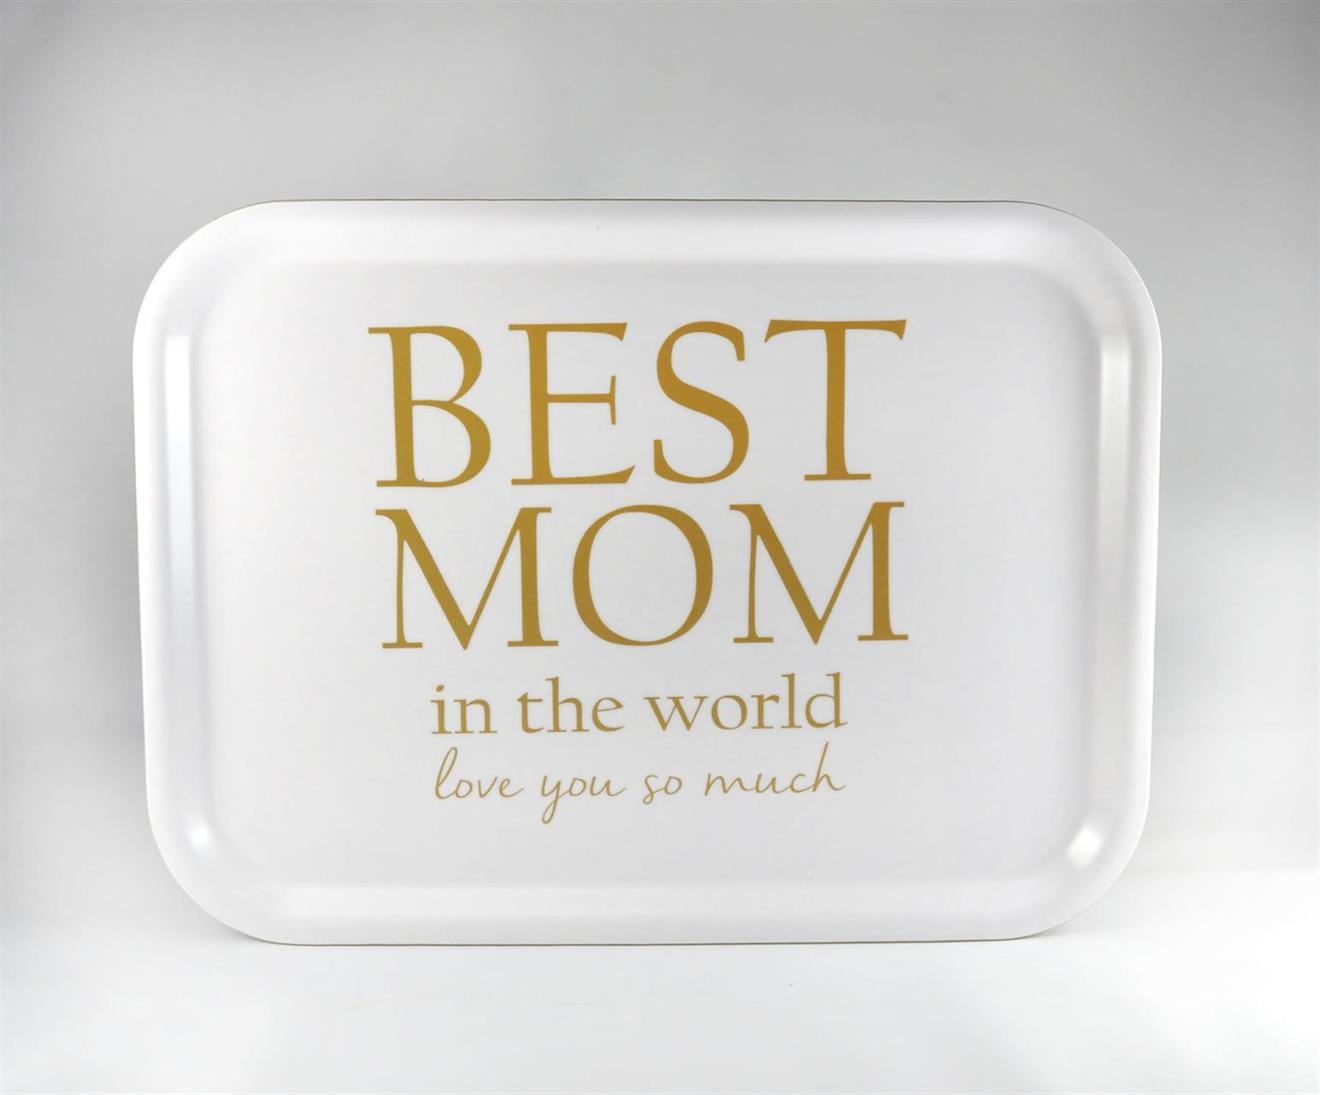 Bricka 27x20 cm, Best Mom, vit/guldtext